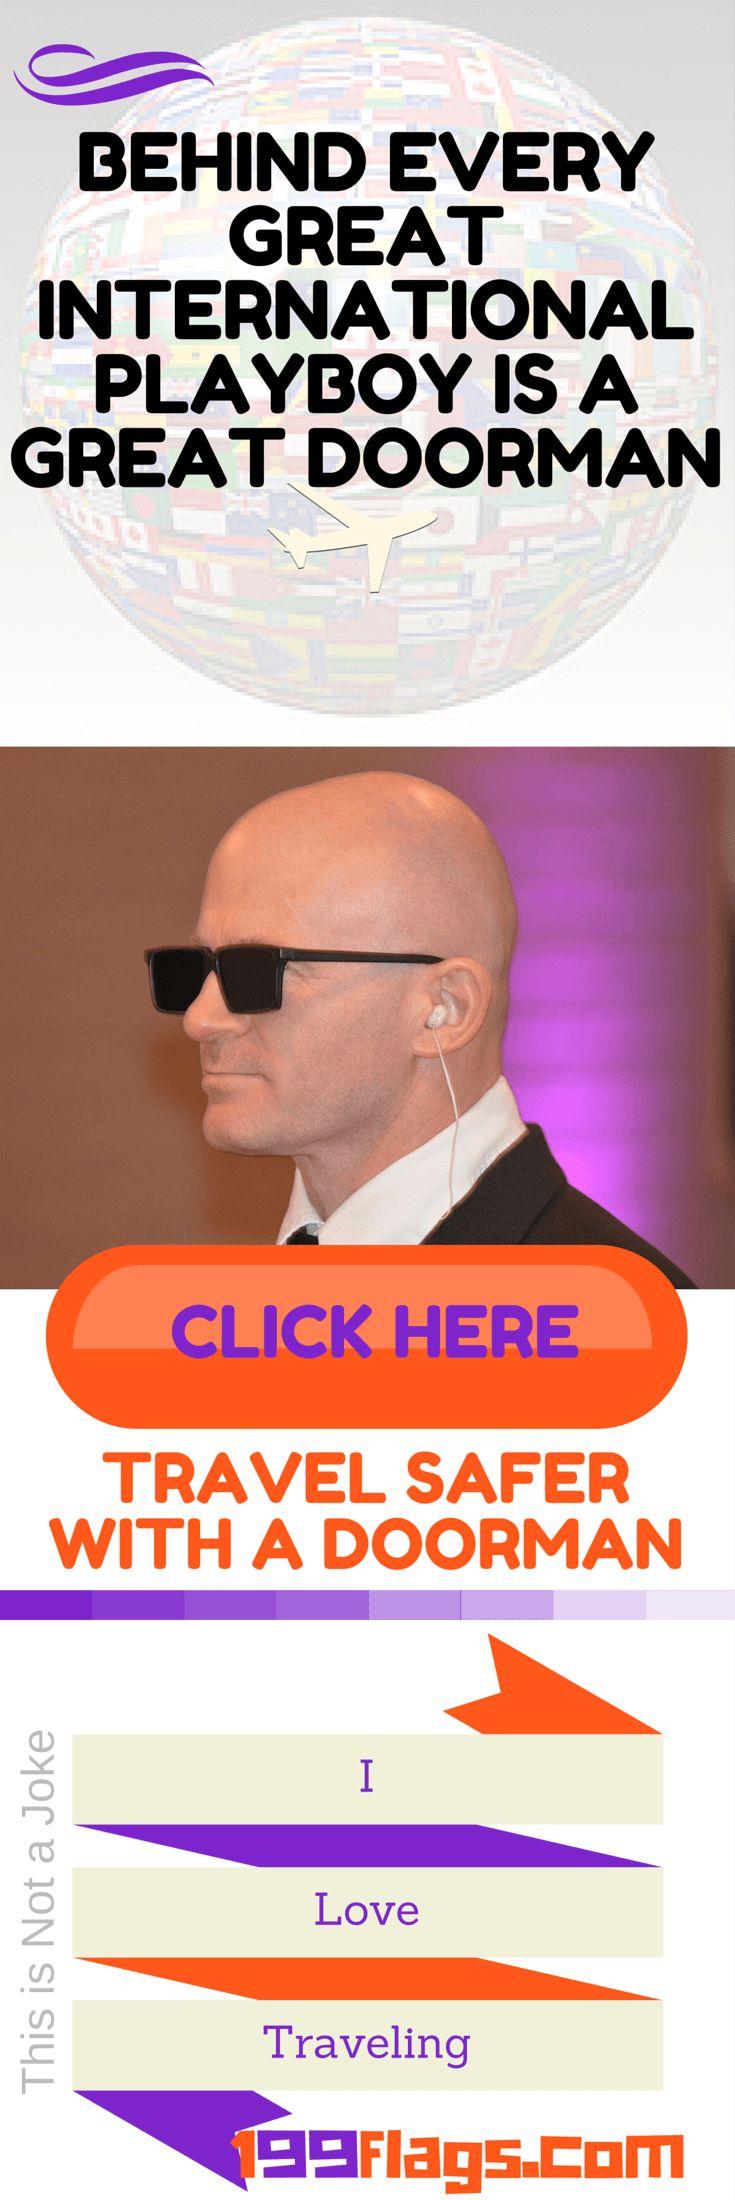 Travel dating online